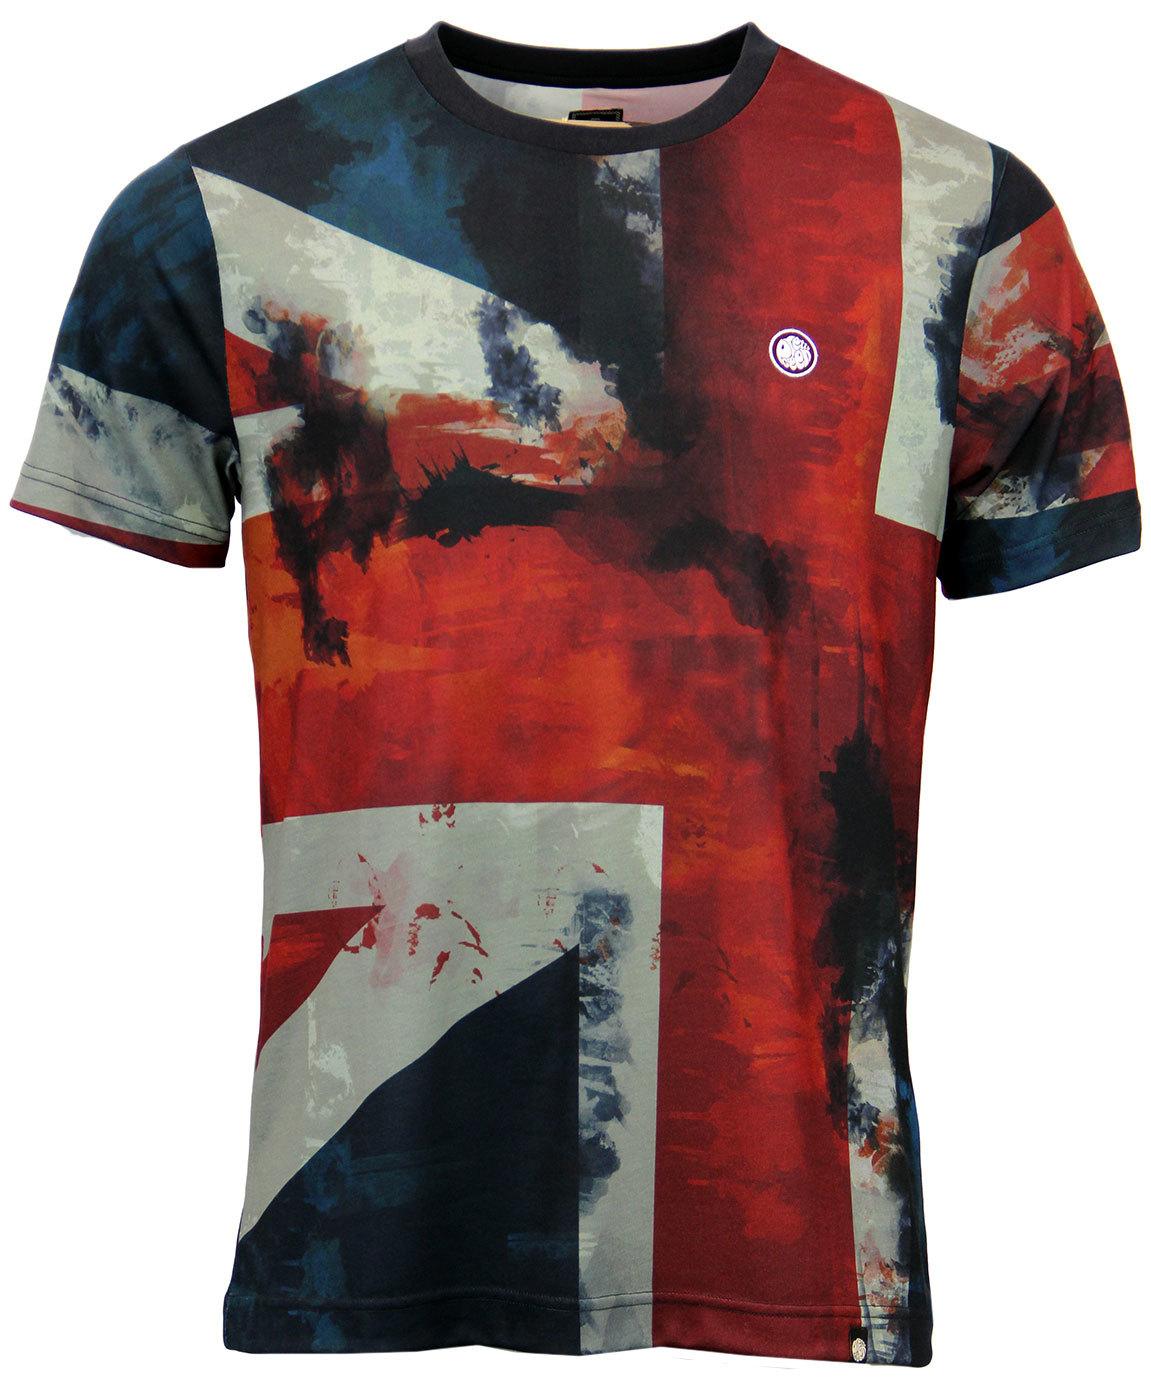 6e4f4e8e4 PRETTY GREEN Retro 1960s Mod Union Jack Print Pop Art T-Shirt